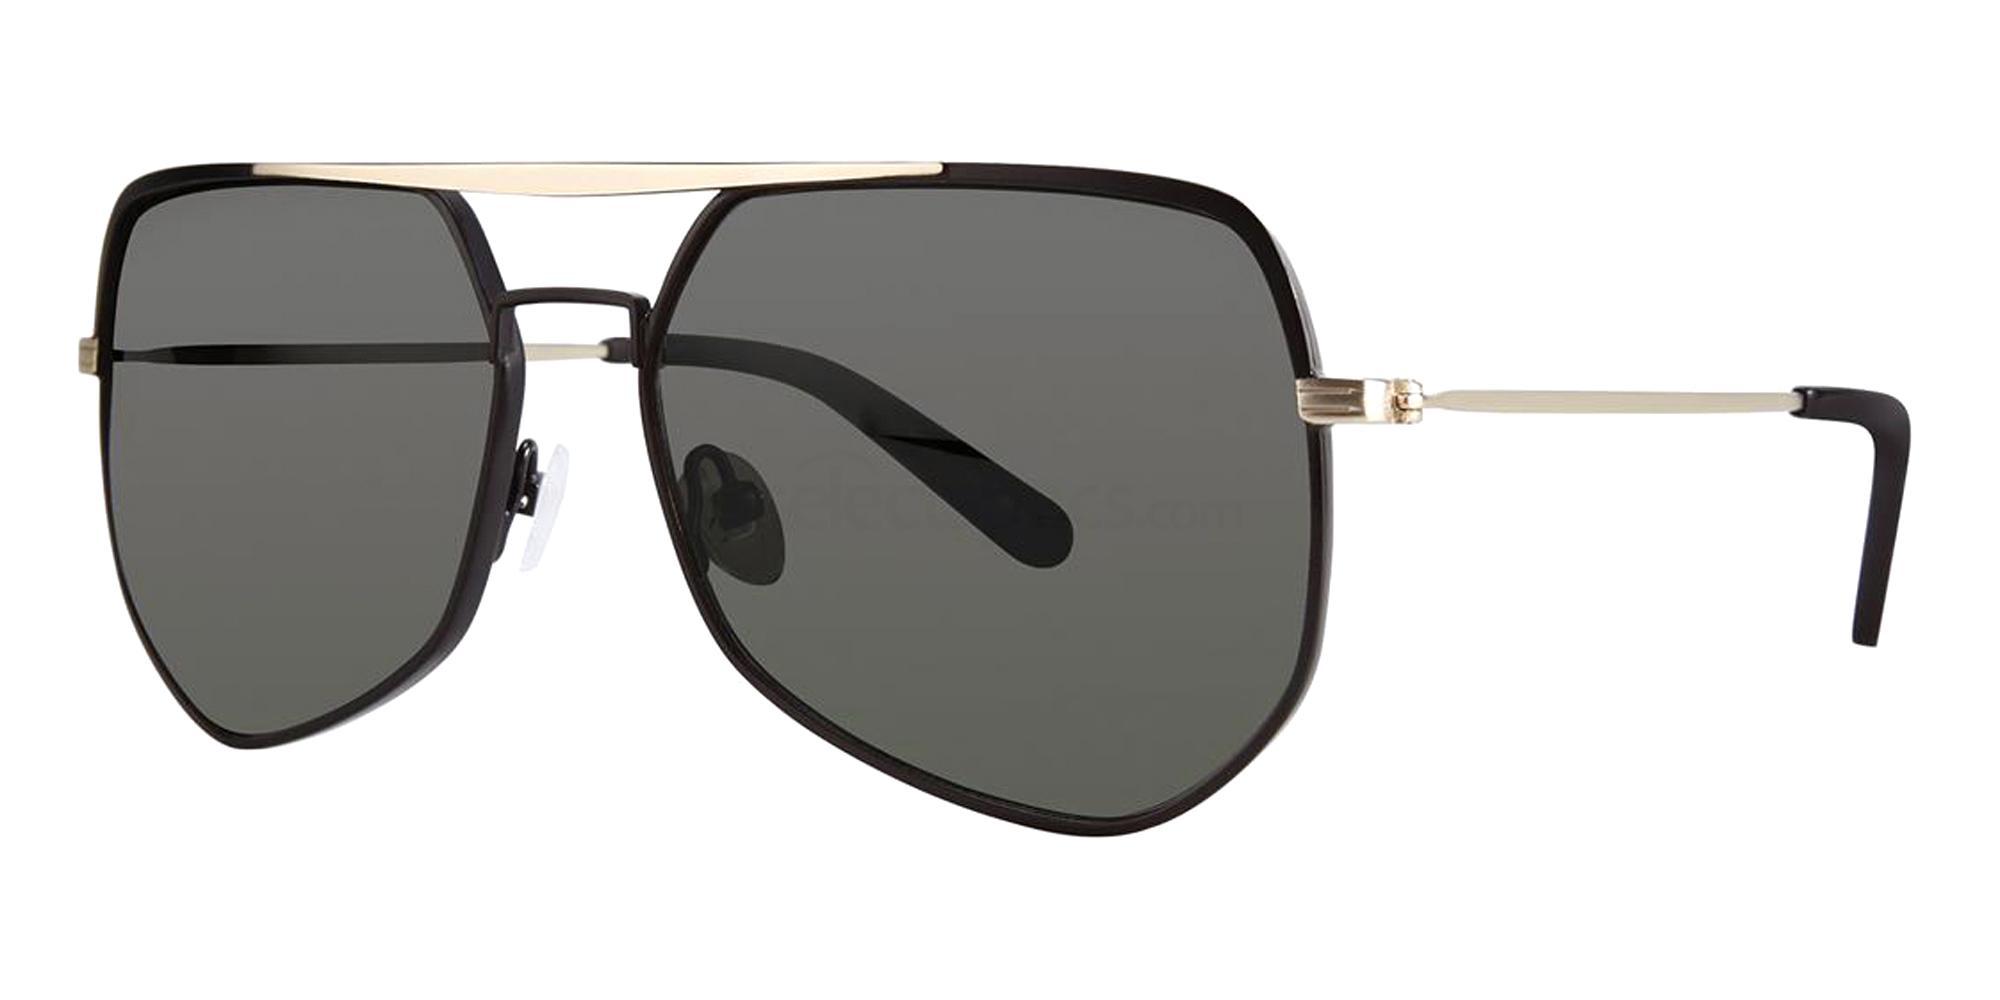 Black Gold THE ICEMAN SUN Sunglasses, Original Penguin